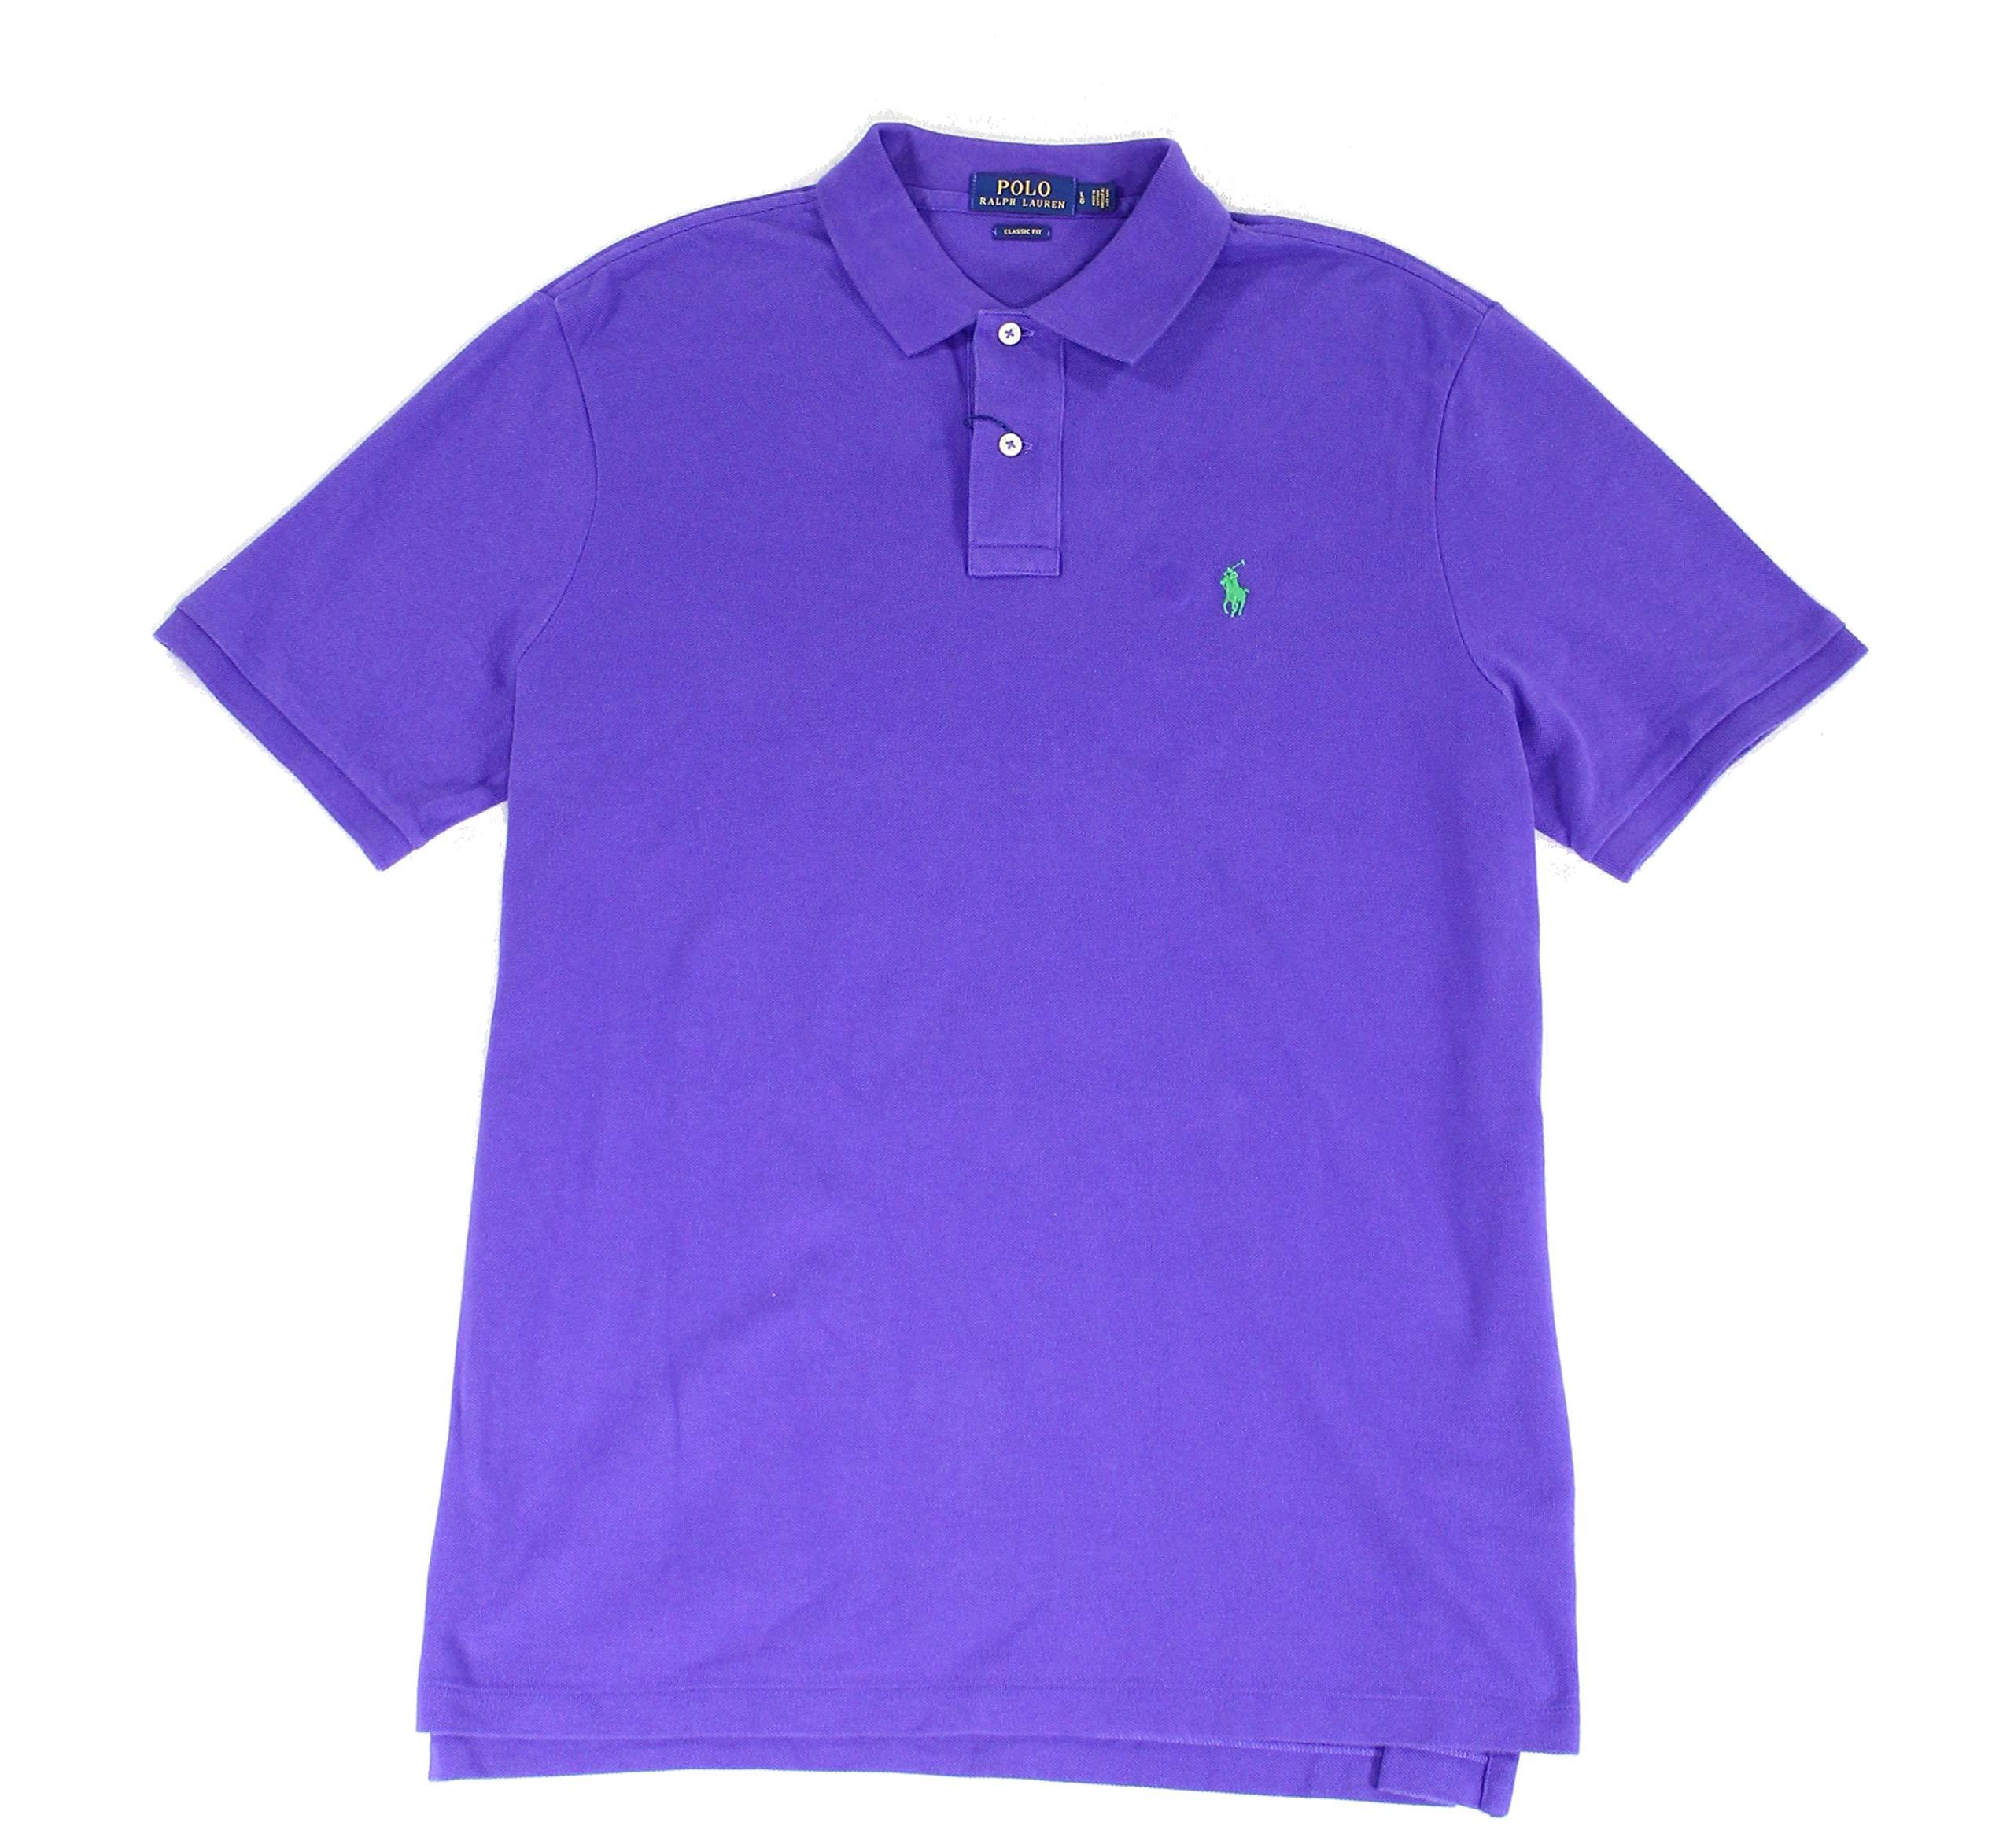 Polo Ralph Lauren Mens Classic Mesh Polo Shirt (S, Dark Purple)